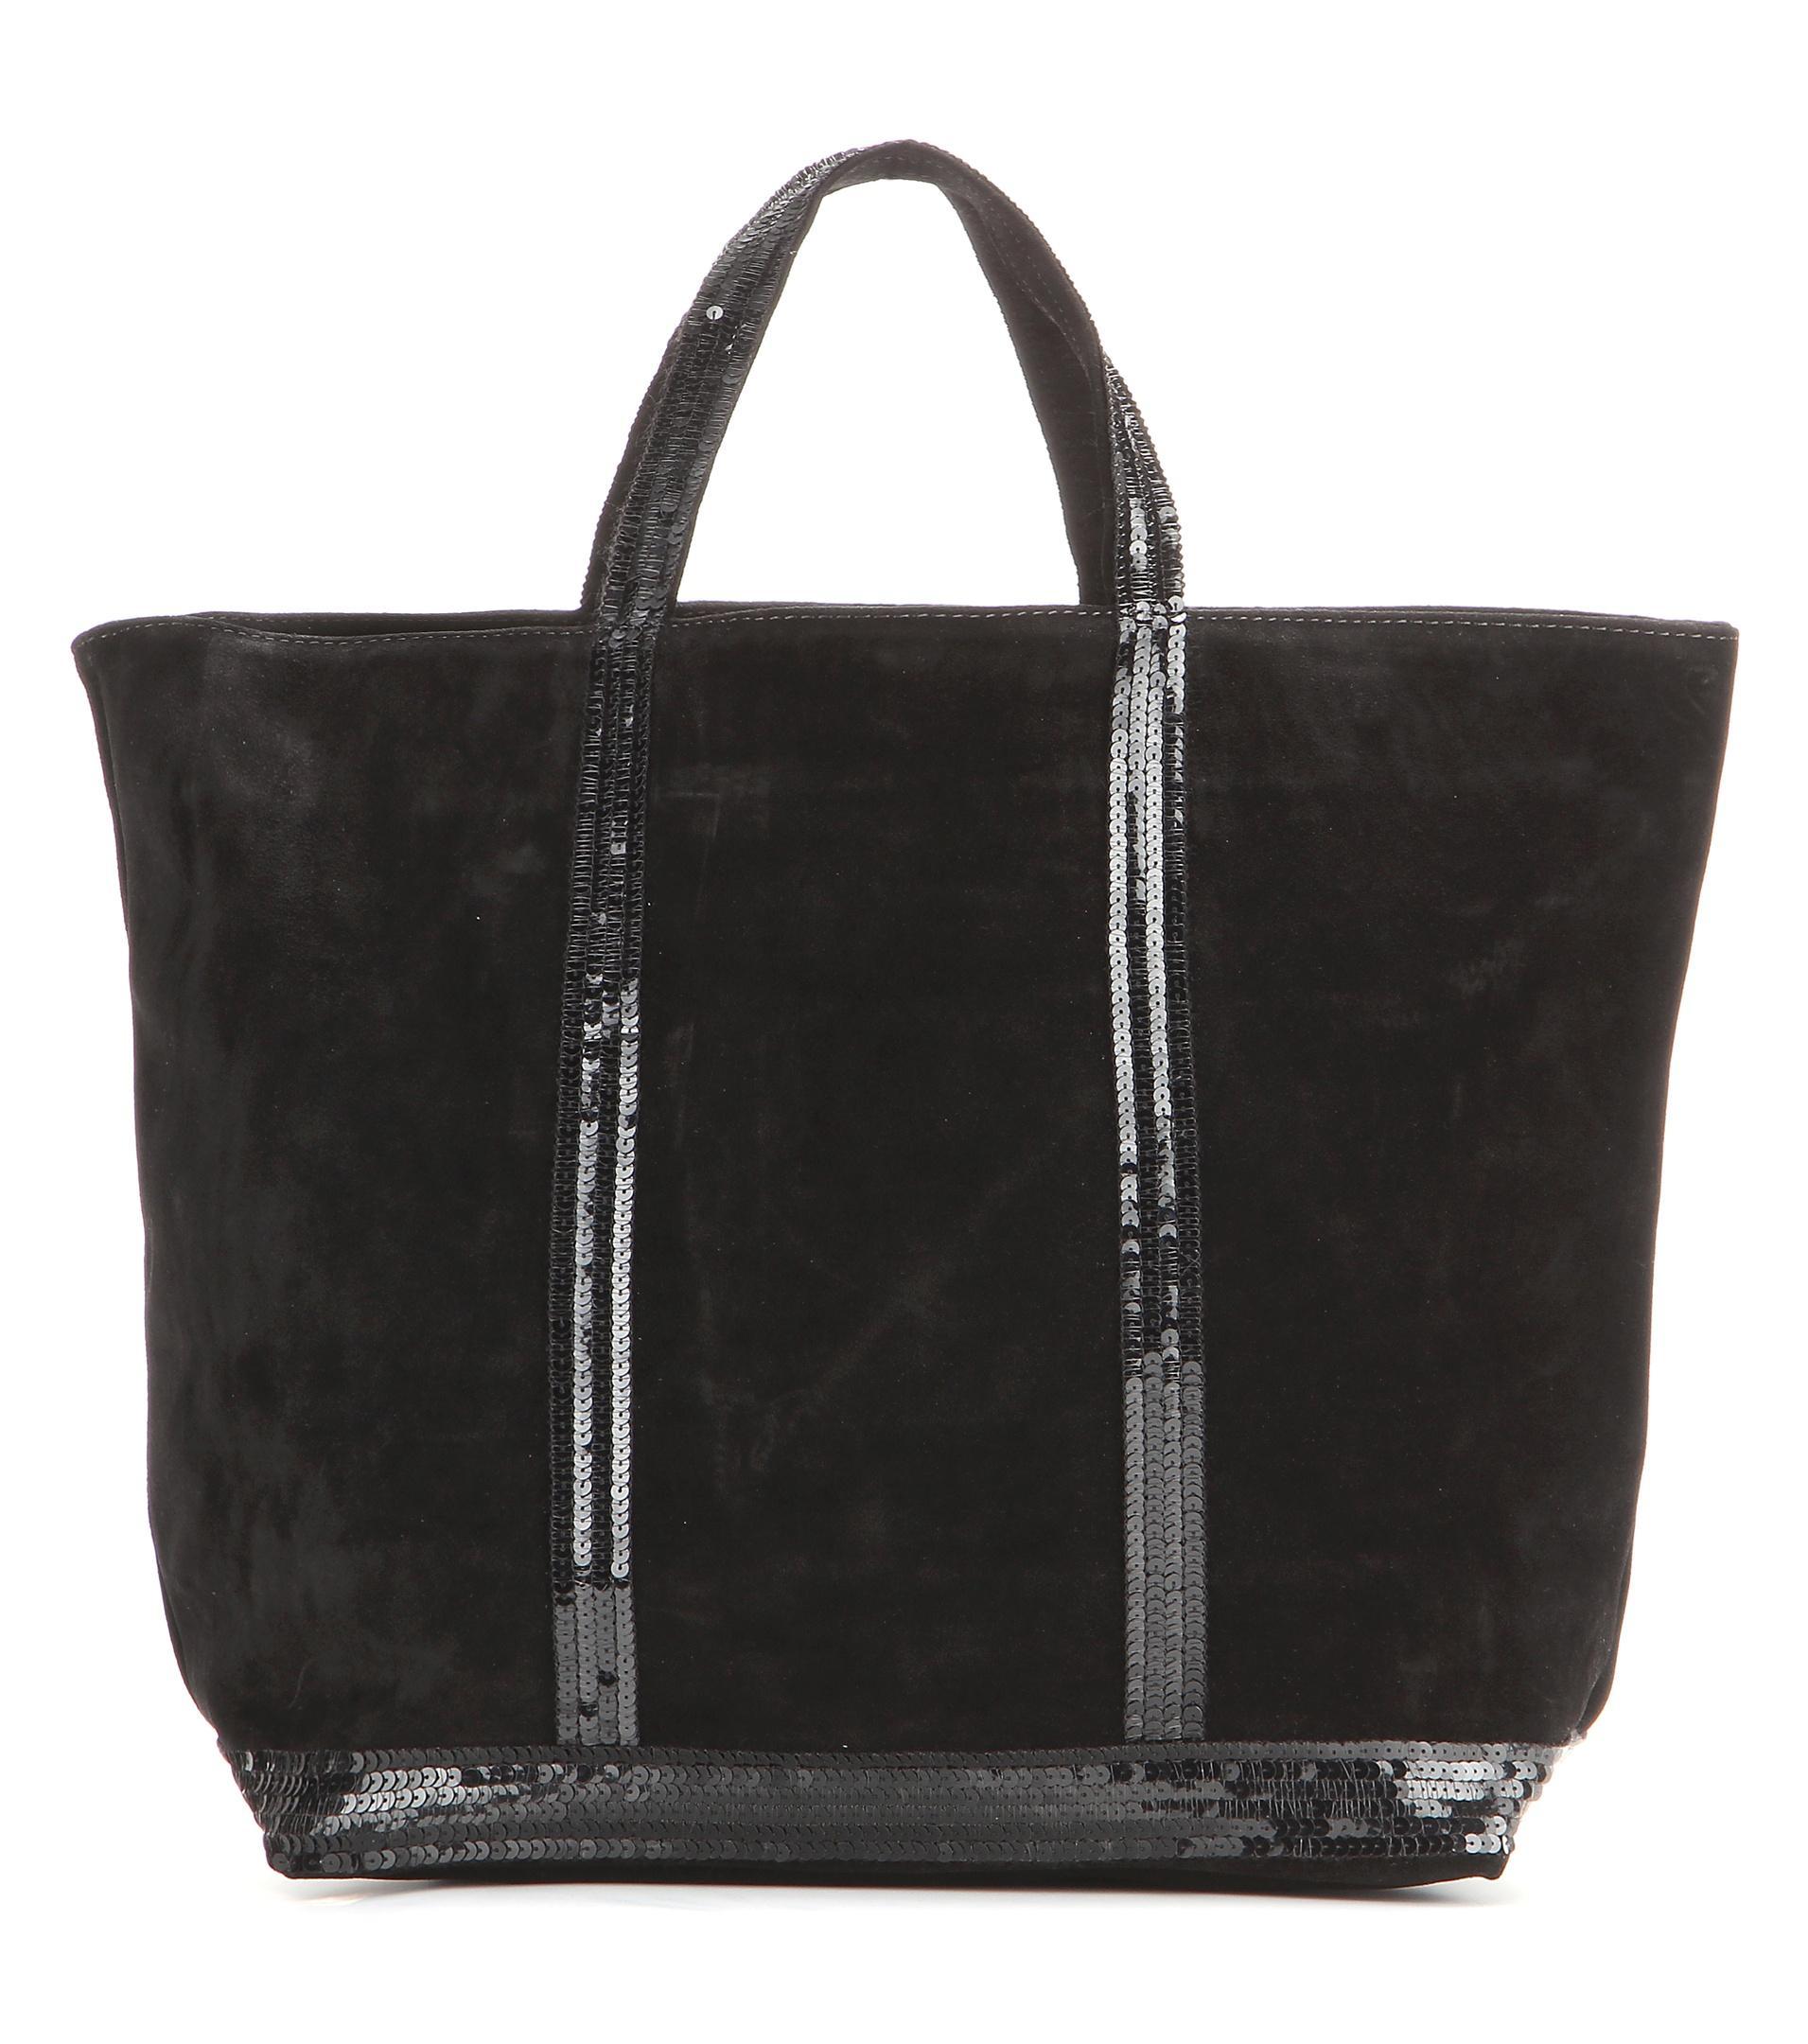 vanessa bruno cabas medium suede shopper in black lyst. Black Bedroom Furniture Sets. Home Design Ideas